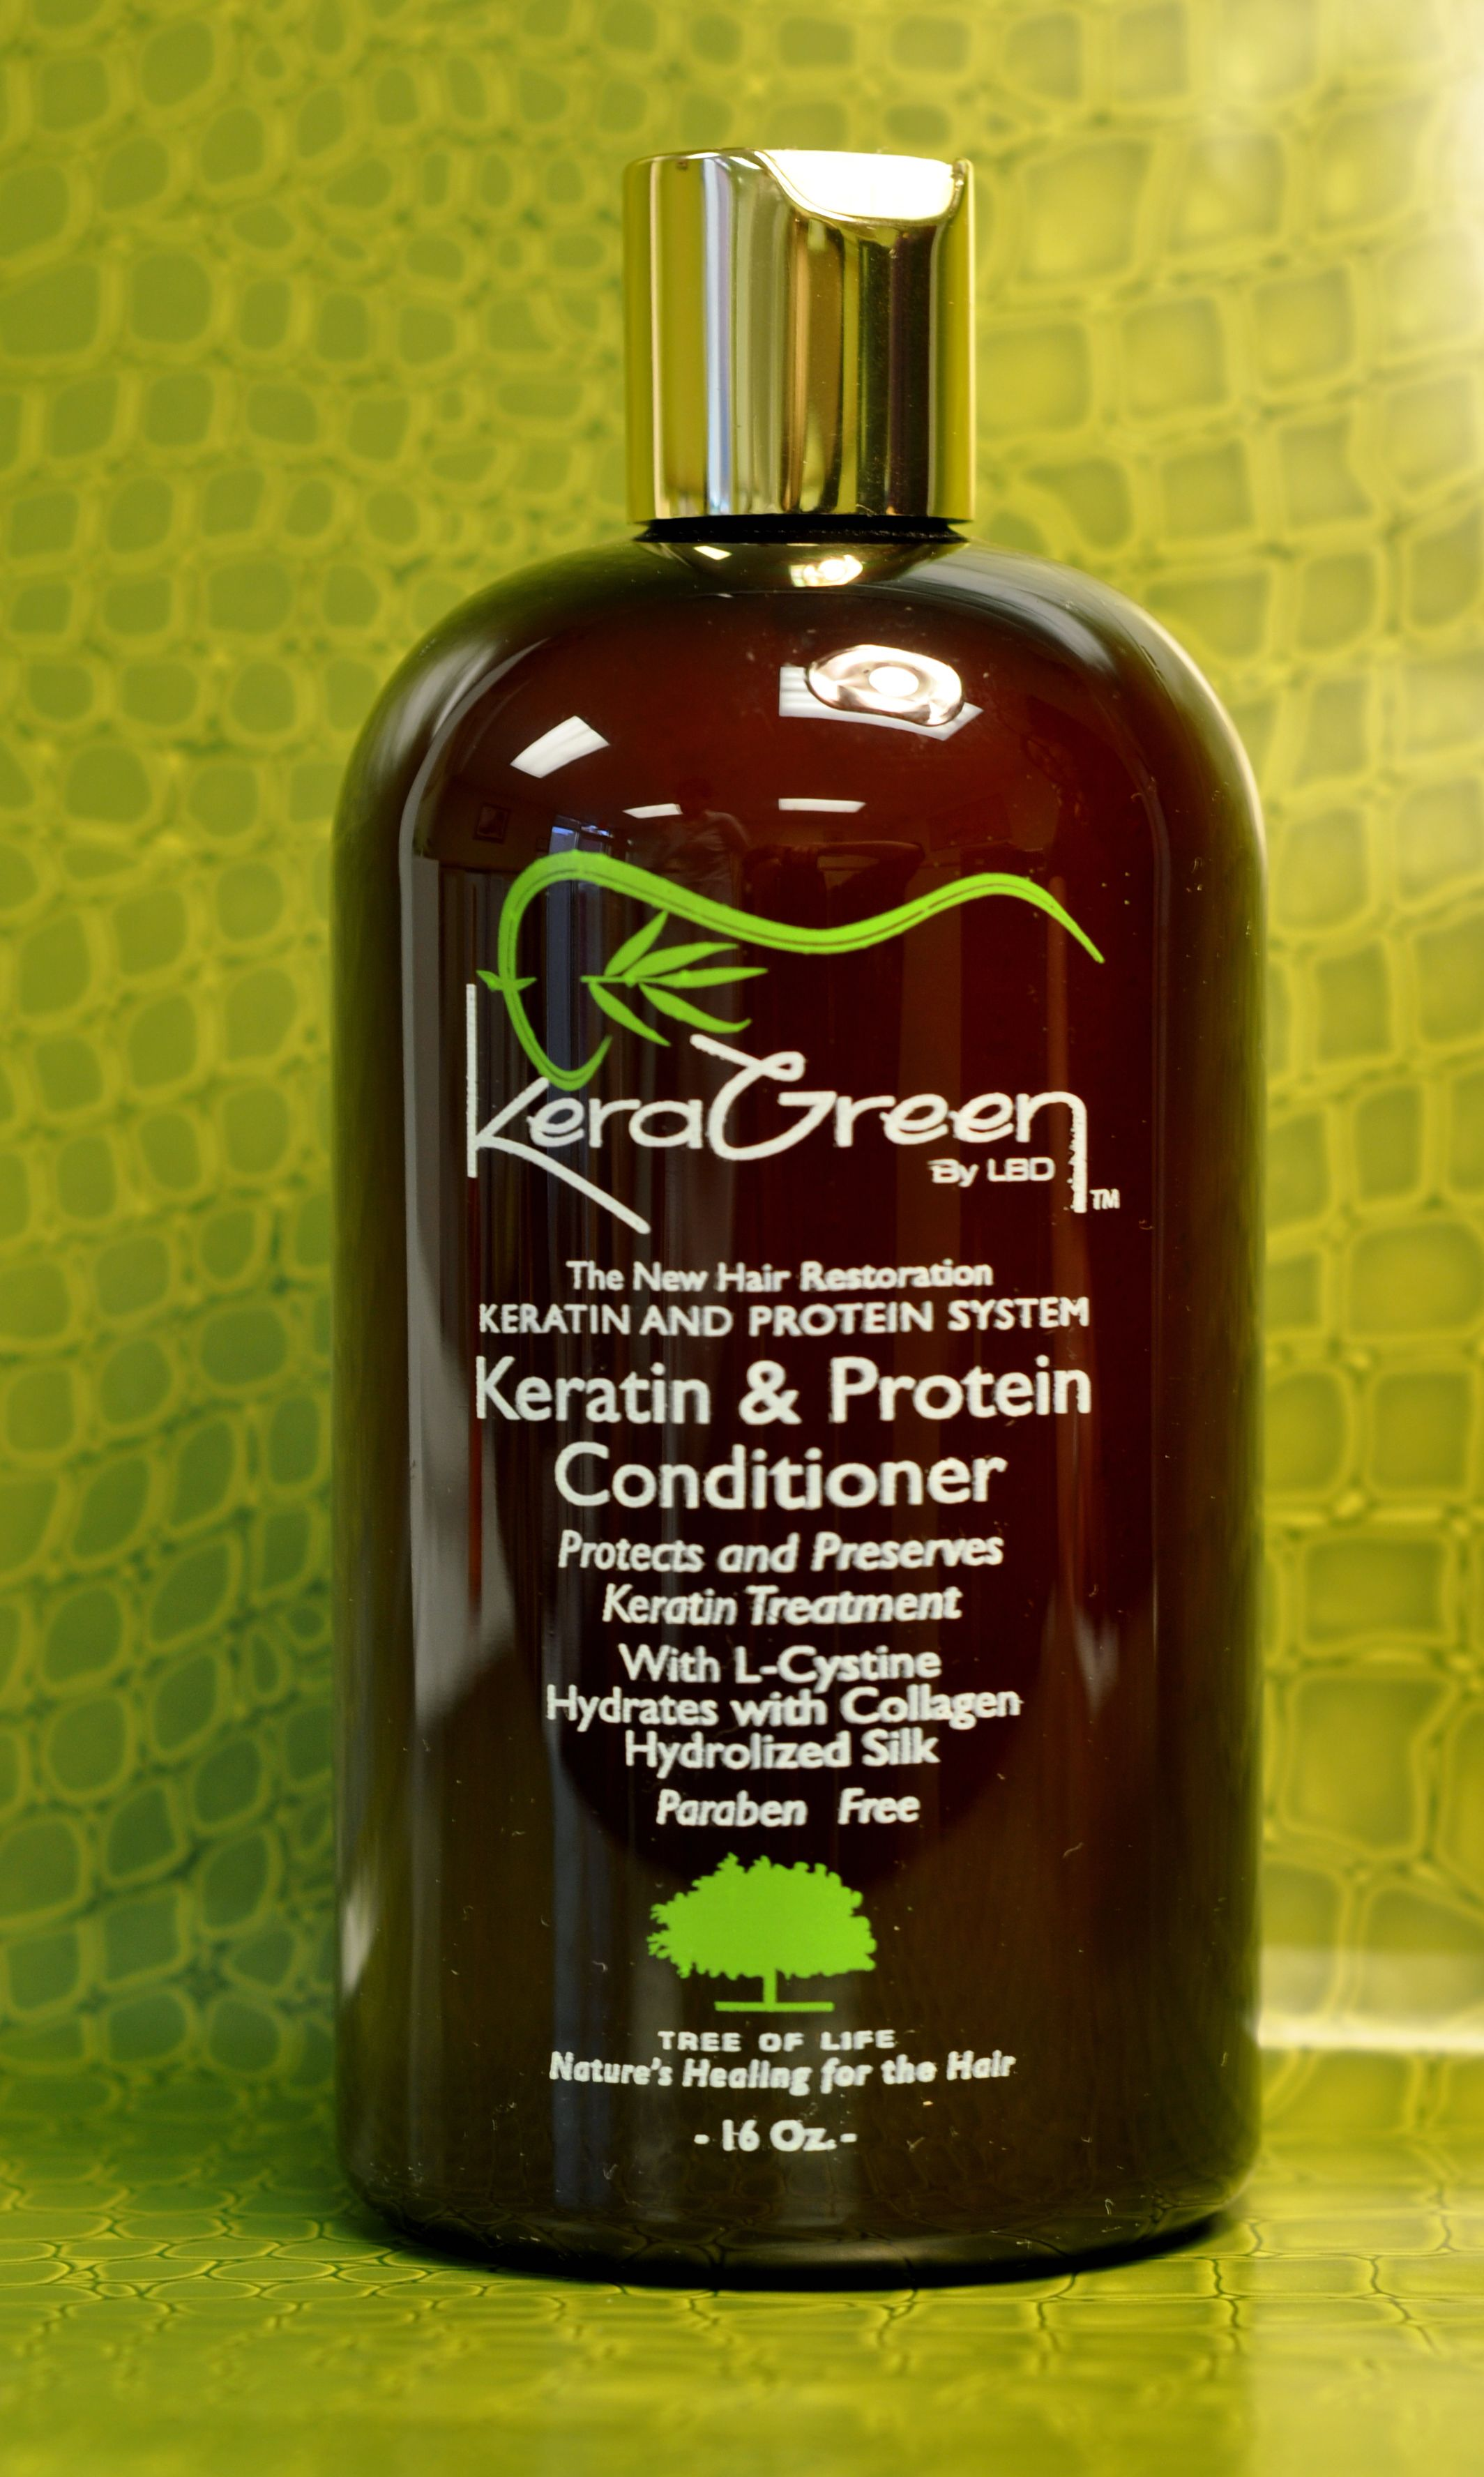 Keragreen Keratin Smoothing System Protein Conditioner Keratin